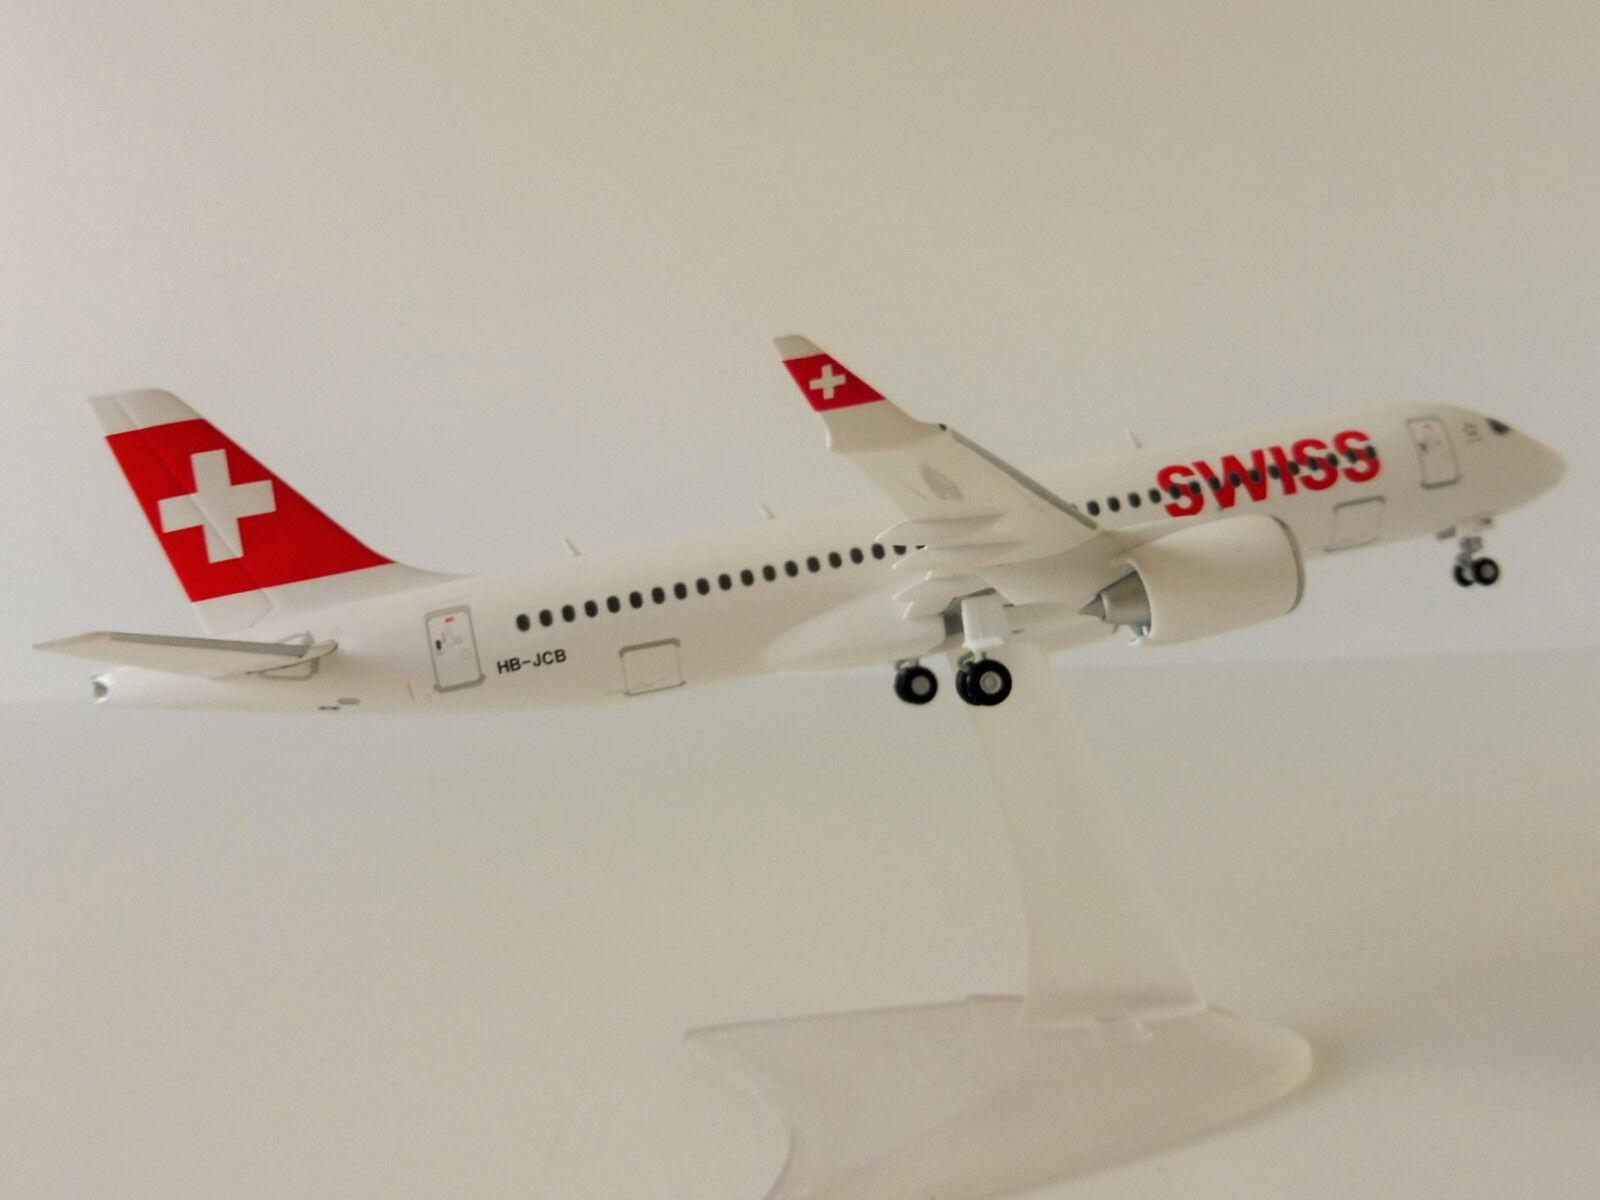 Swiss Bombardier cs300 1 200 Herpa 558952 Zurich Airlines HB-JCB Swissair CS 300